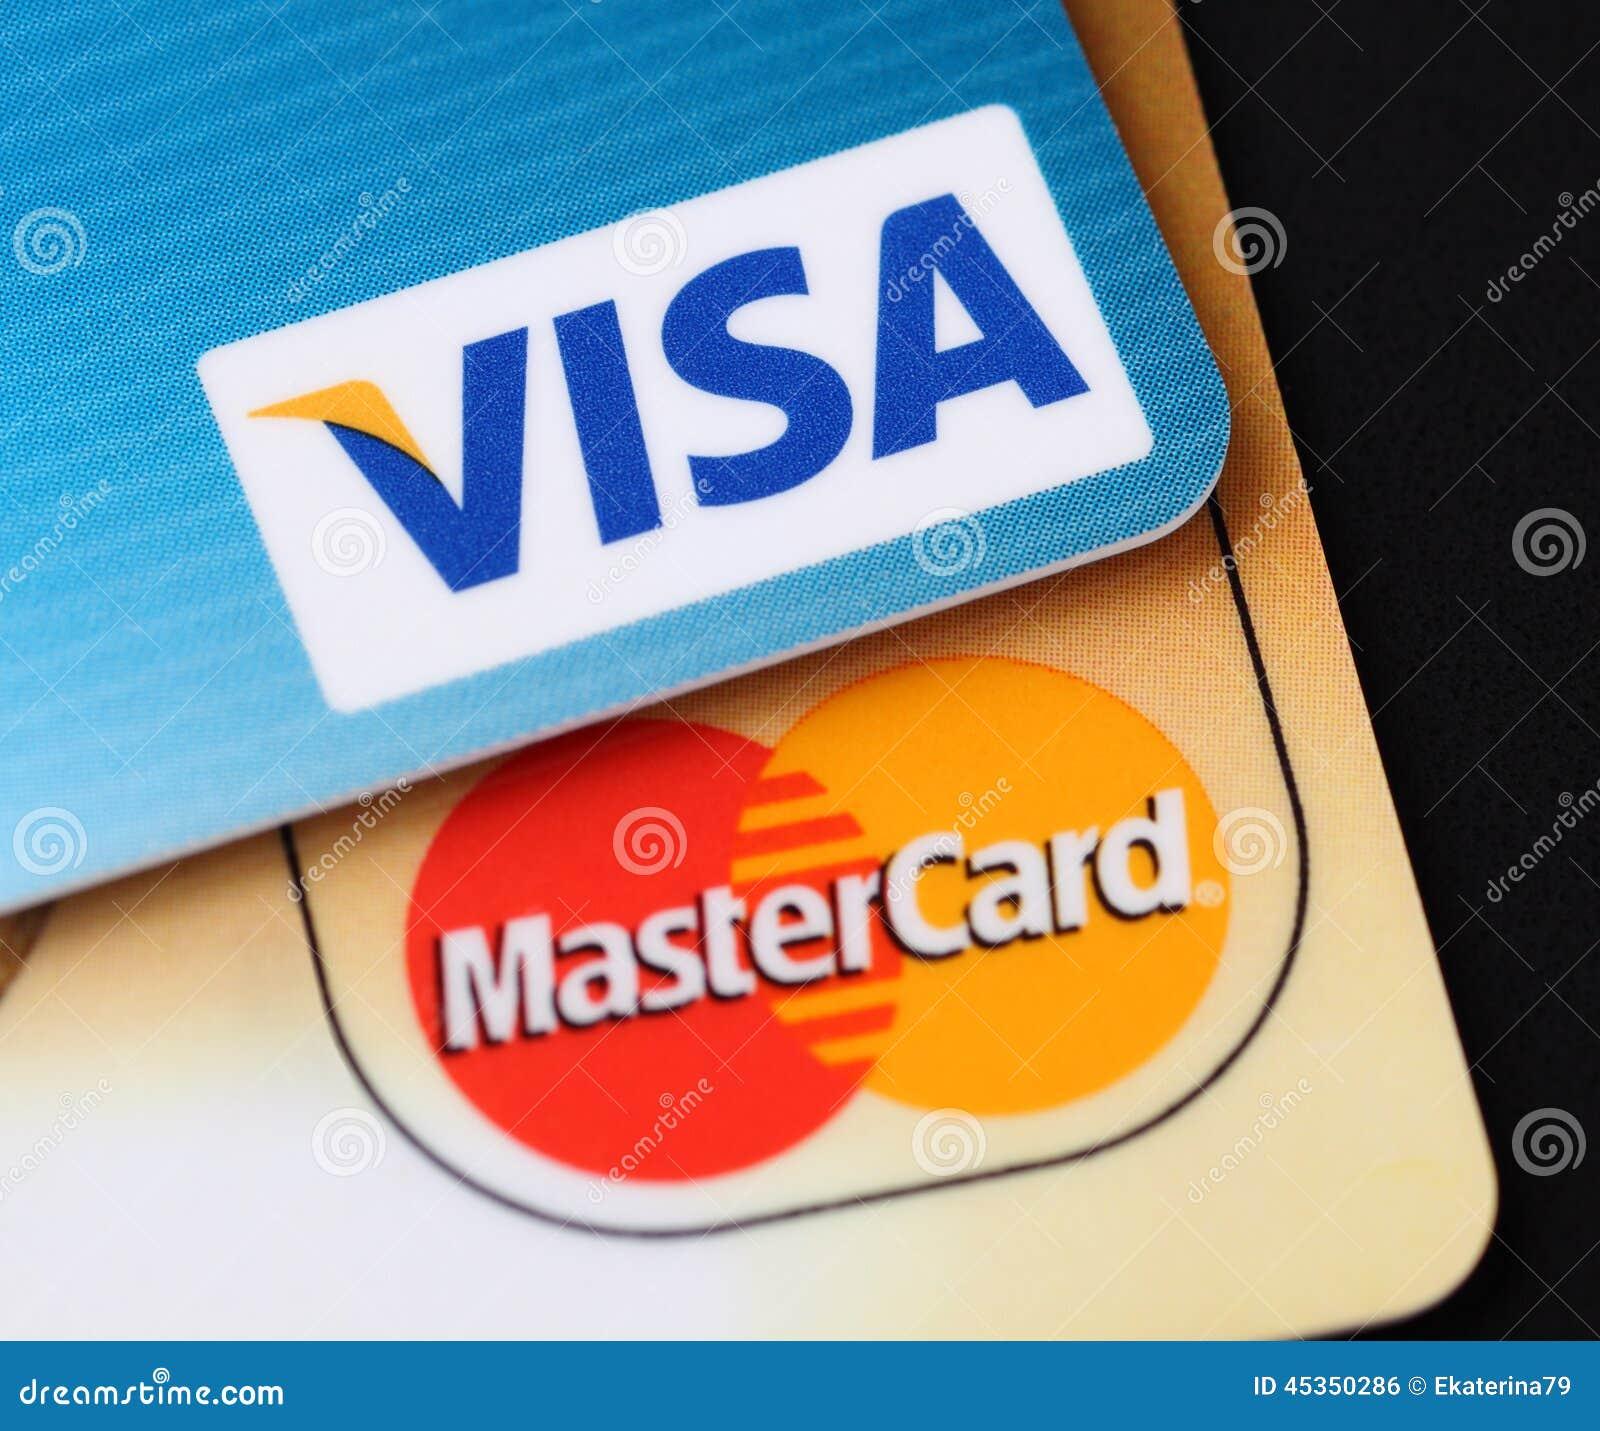 september 11 2012 visa and mastercard logos on credit cards